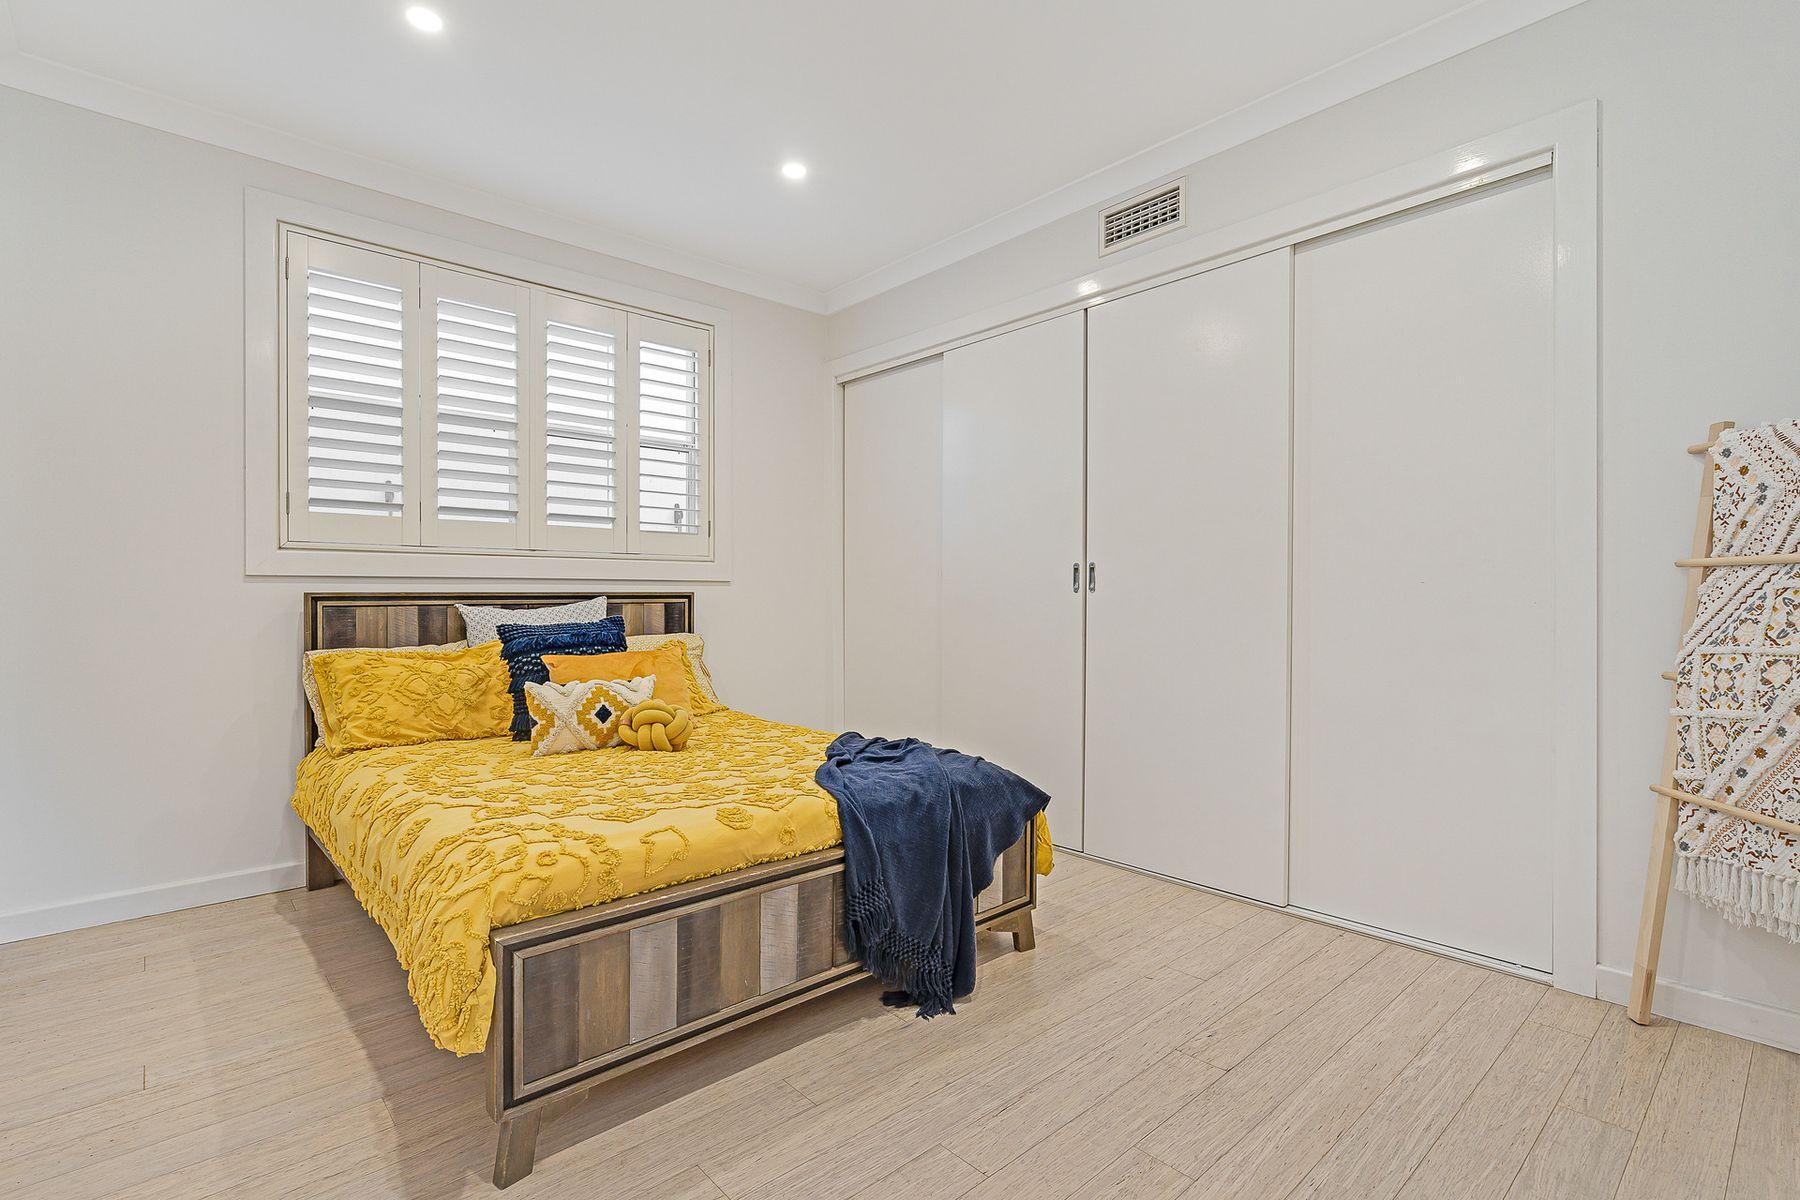 39 Berner Street, Merewether, NSW 2291